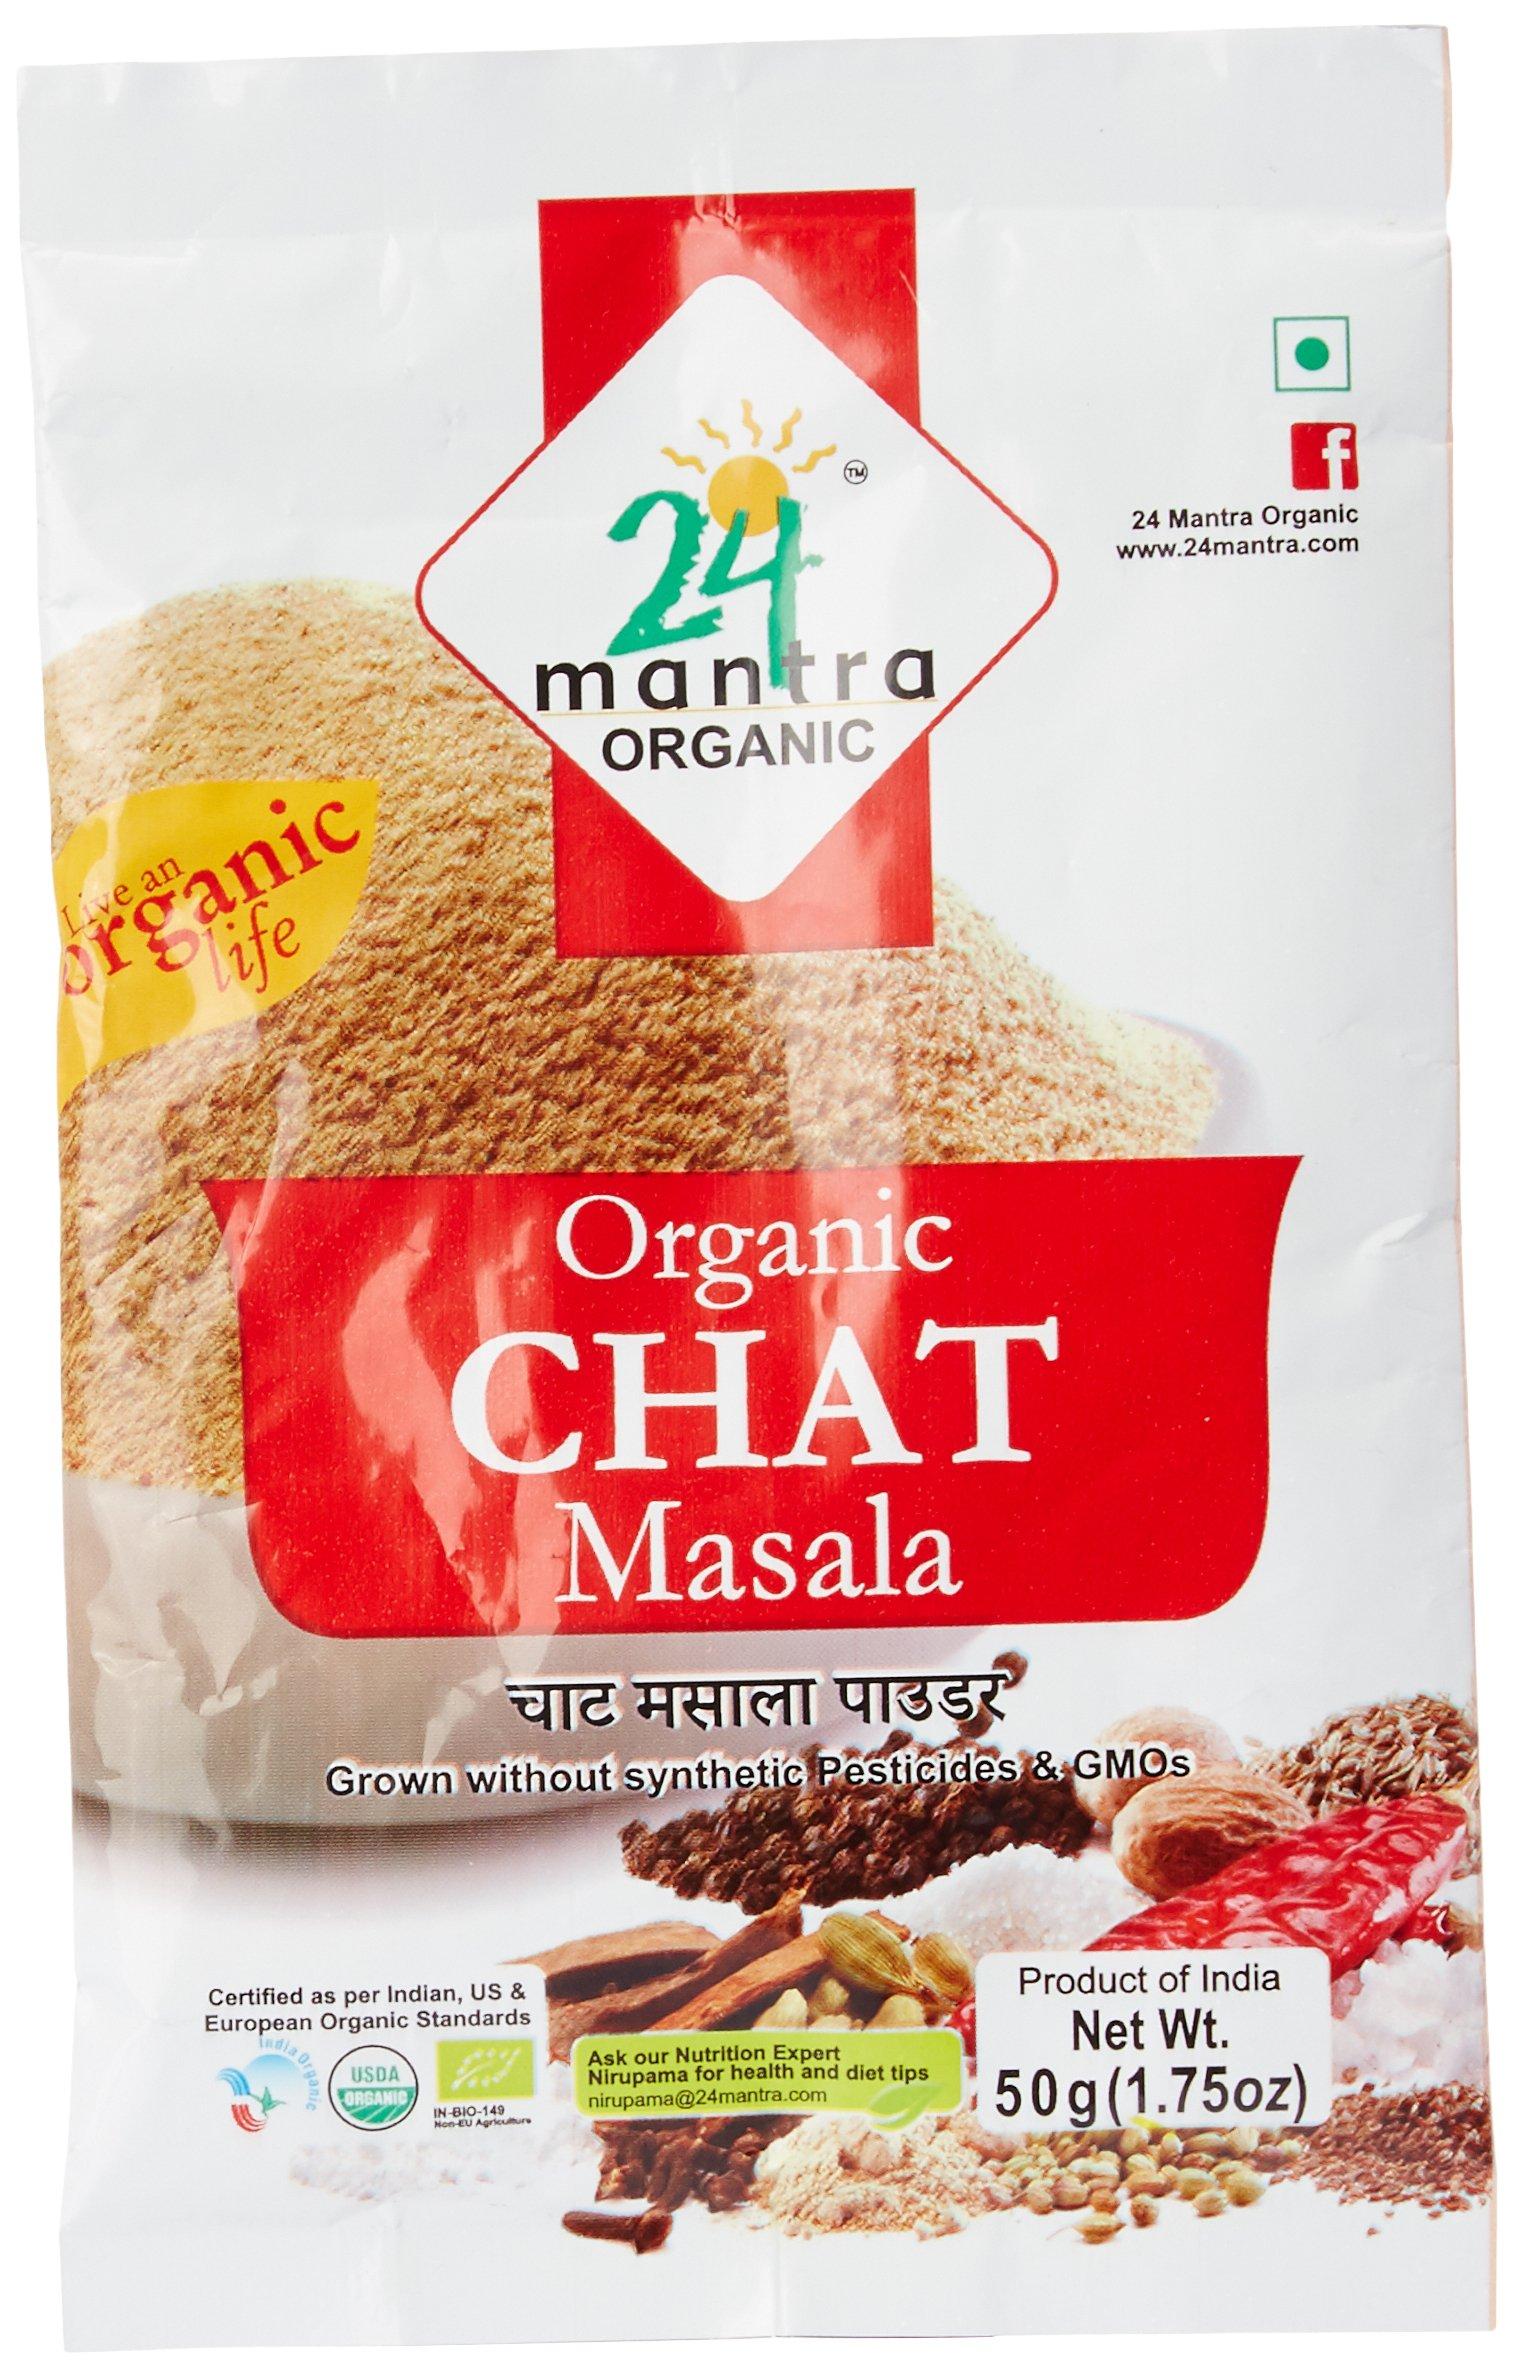 Amazon price history for 24 Mantra Organic Chat Masala, 50g